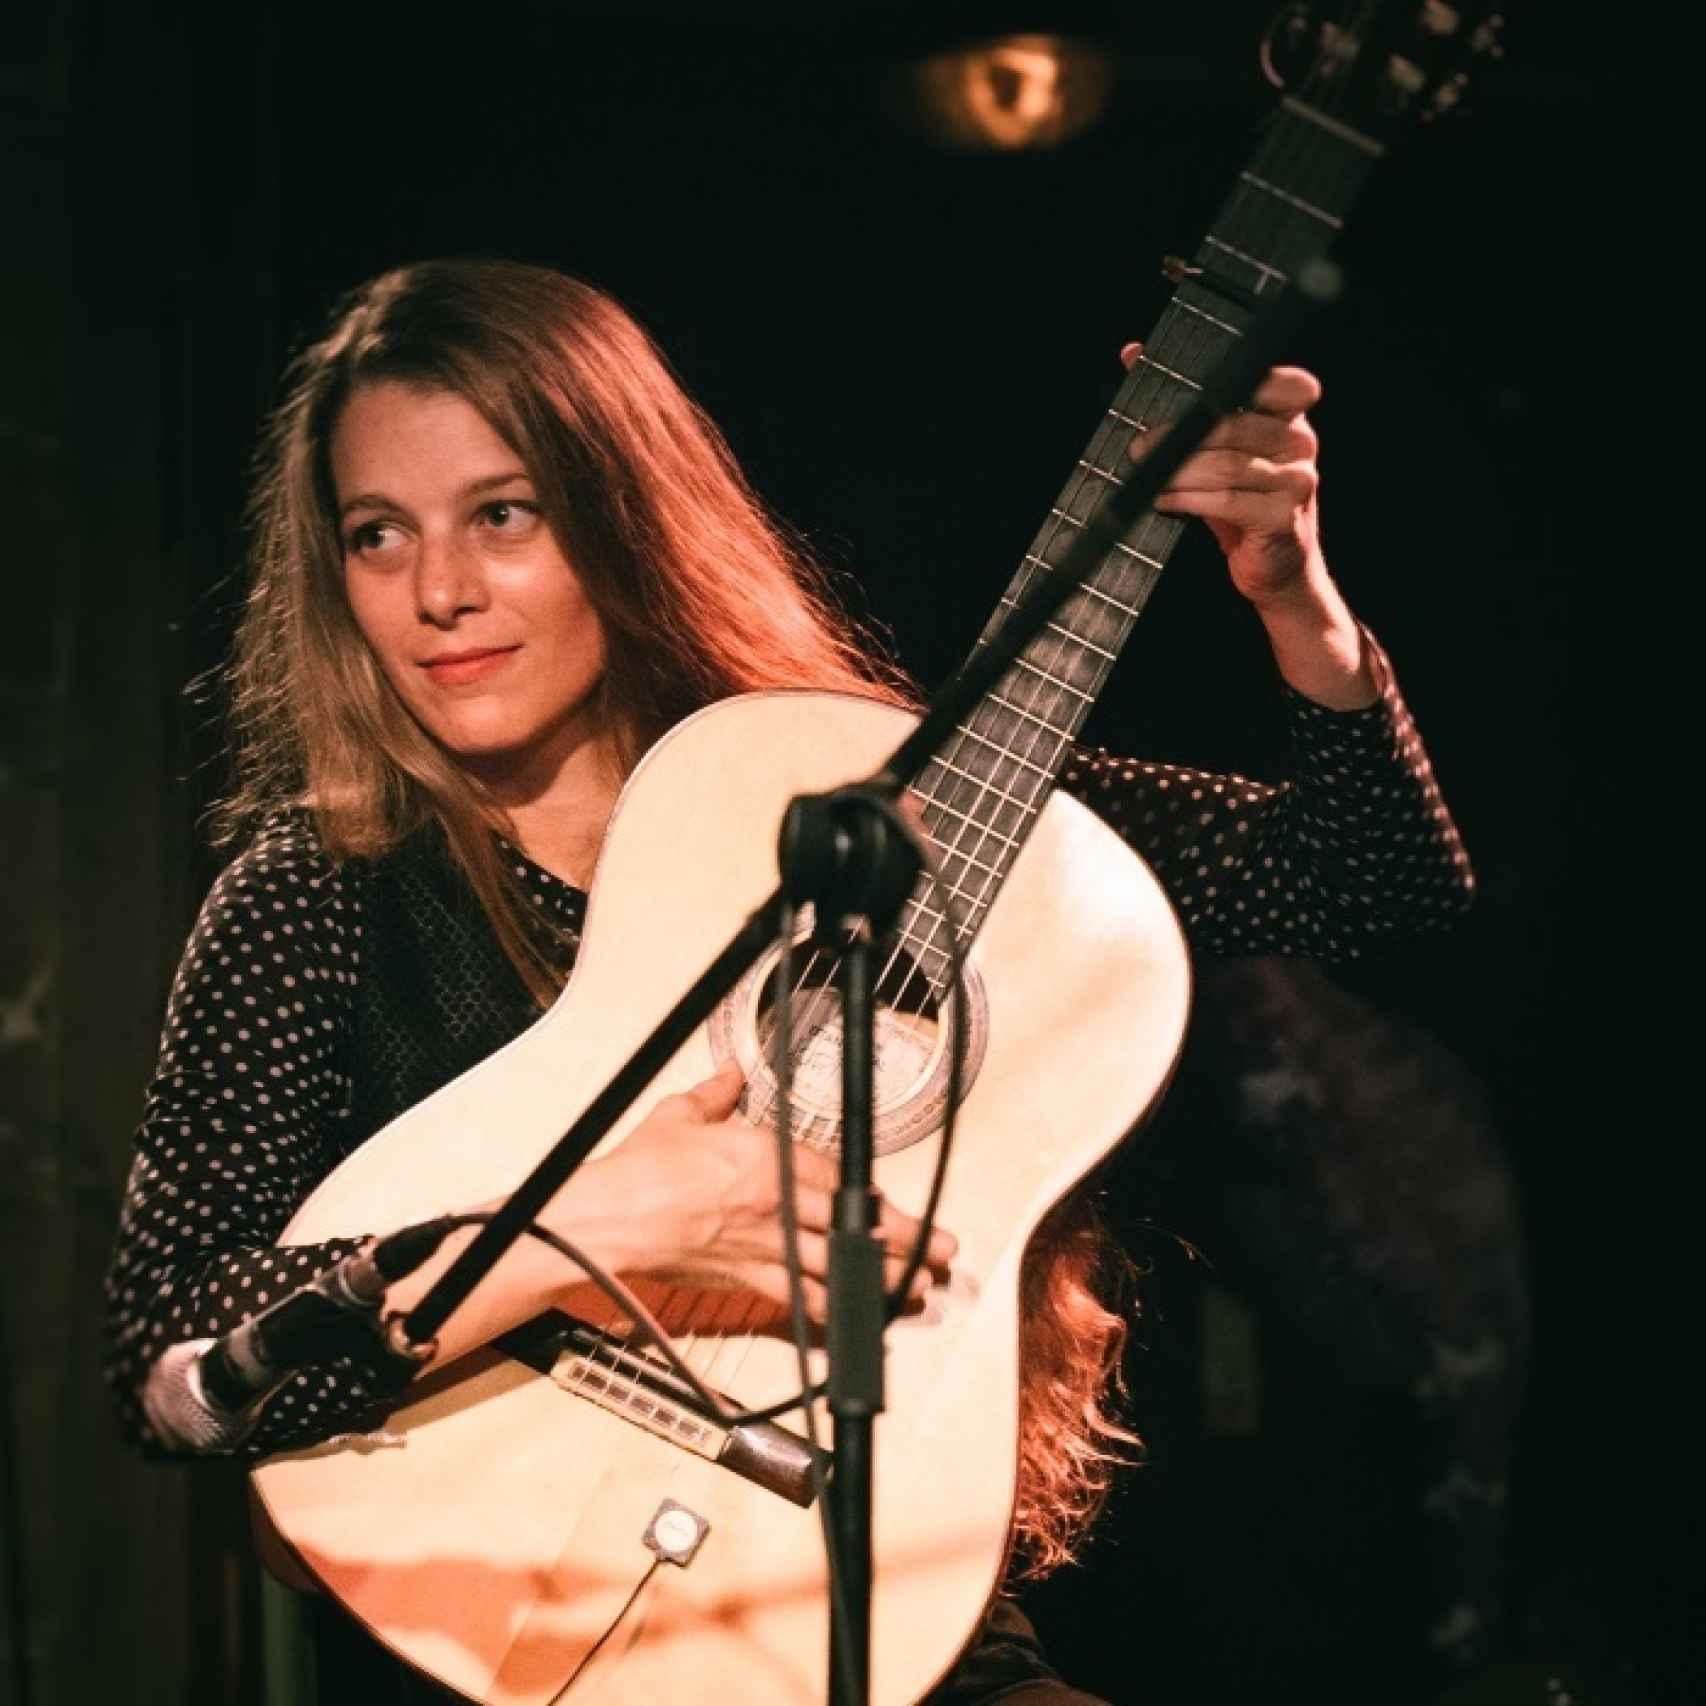 La guitarrista Noa Drezner.